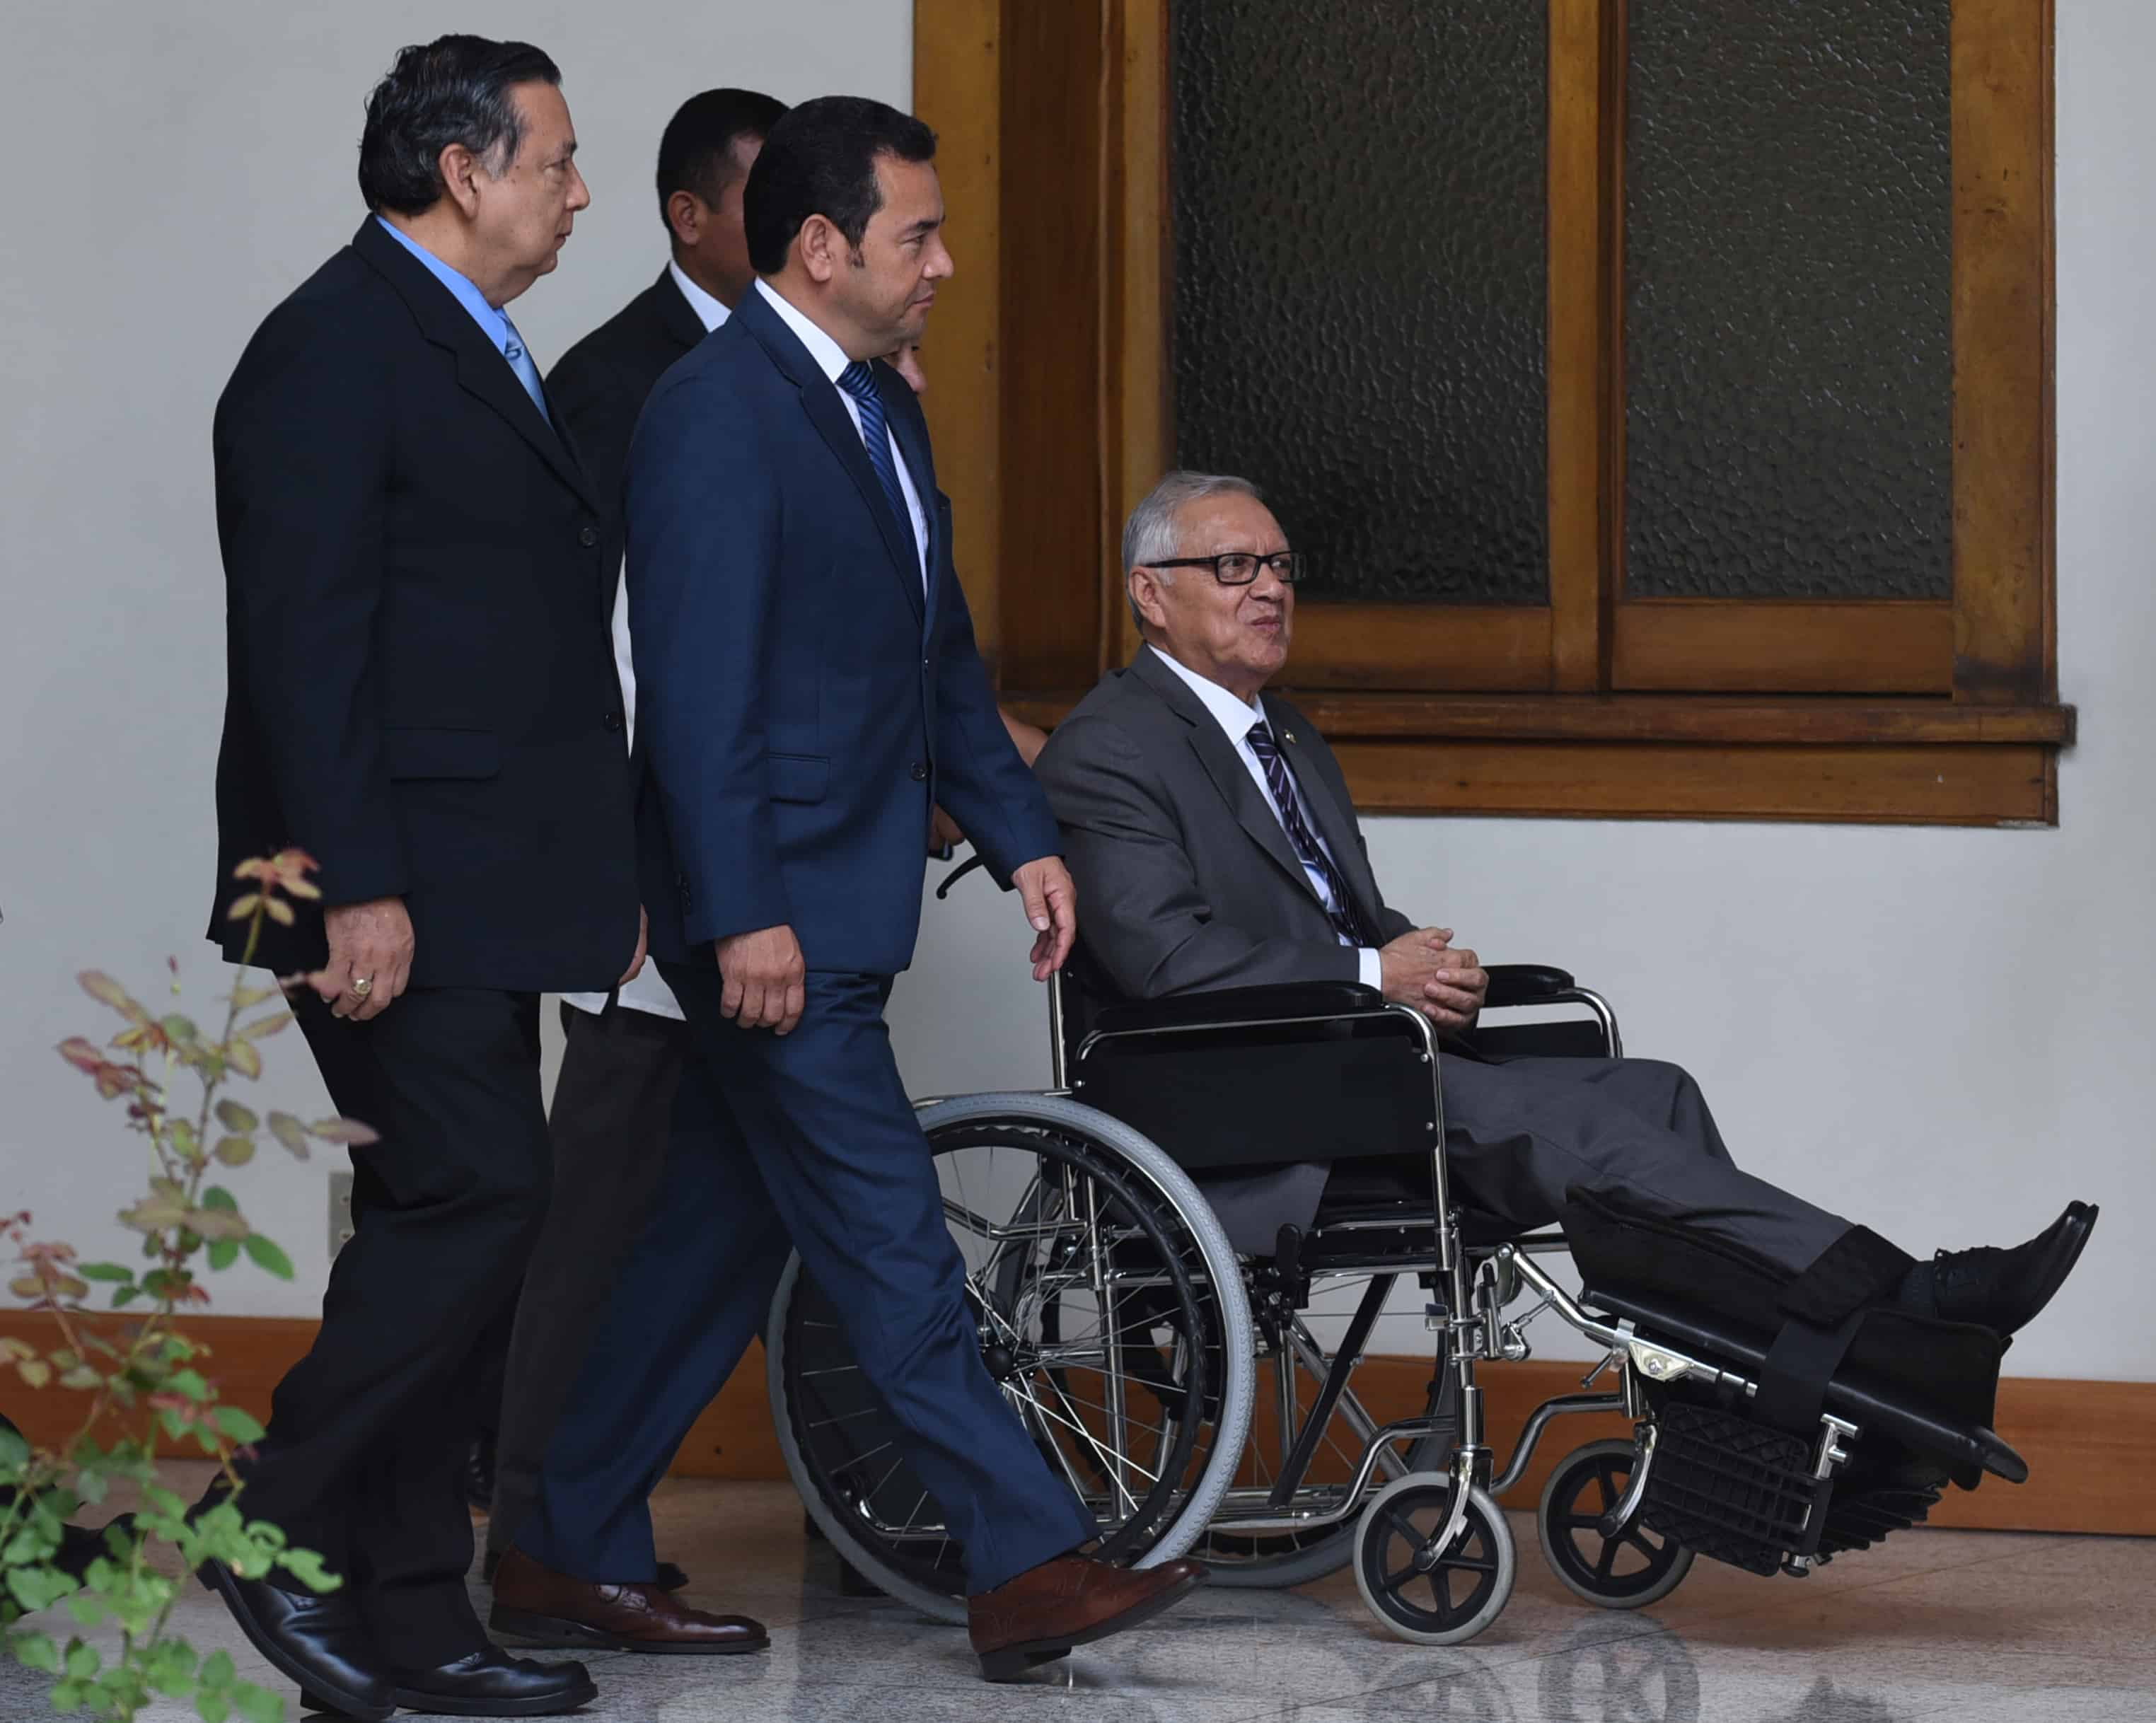 Guatemalan President-elect Jimmy Morales